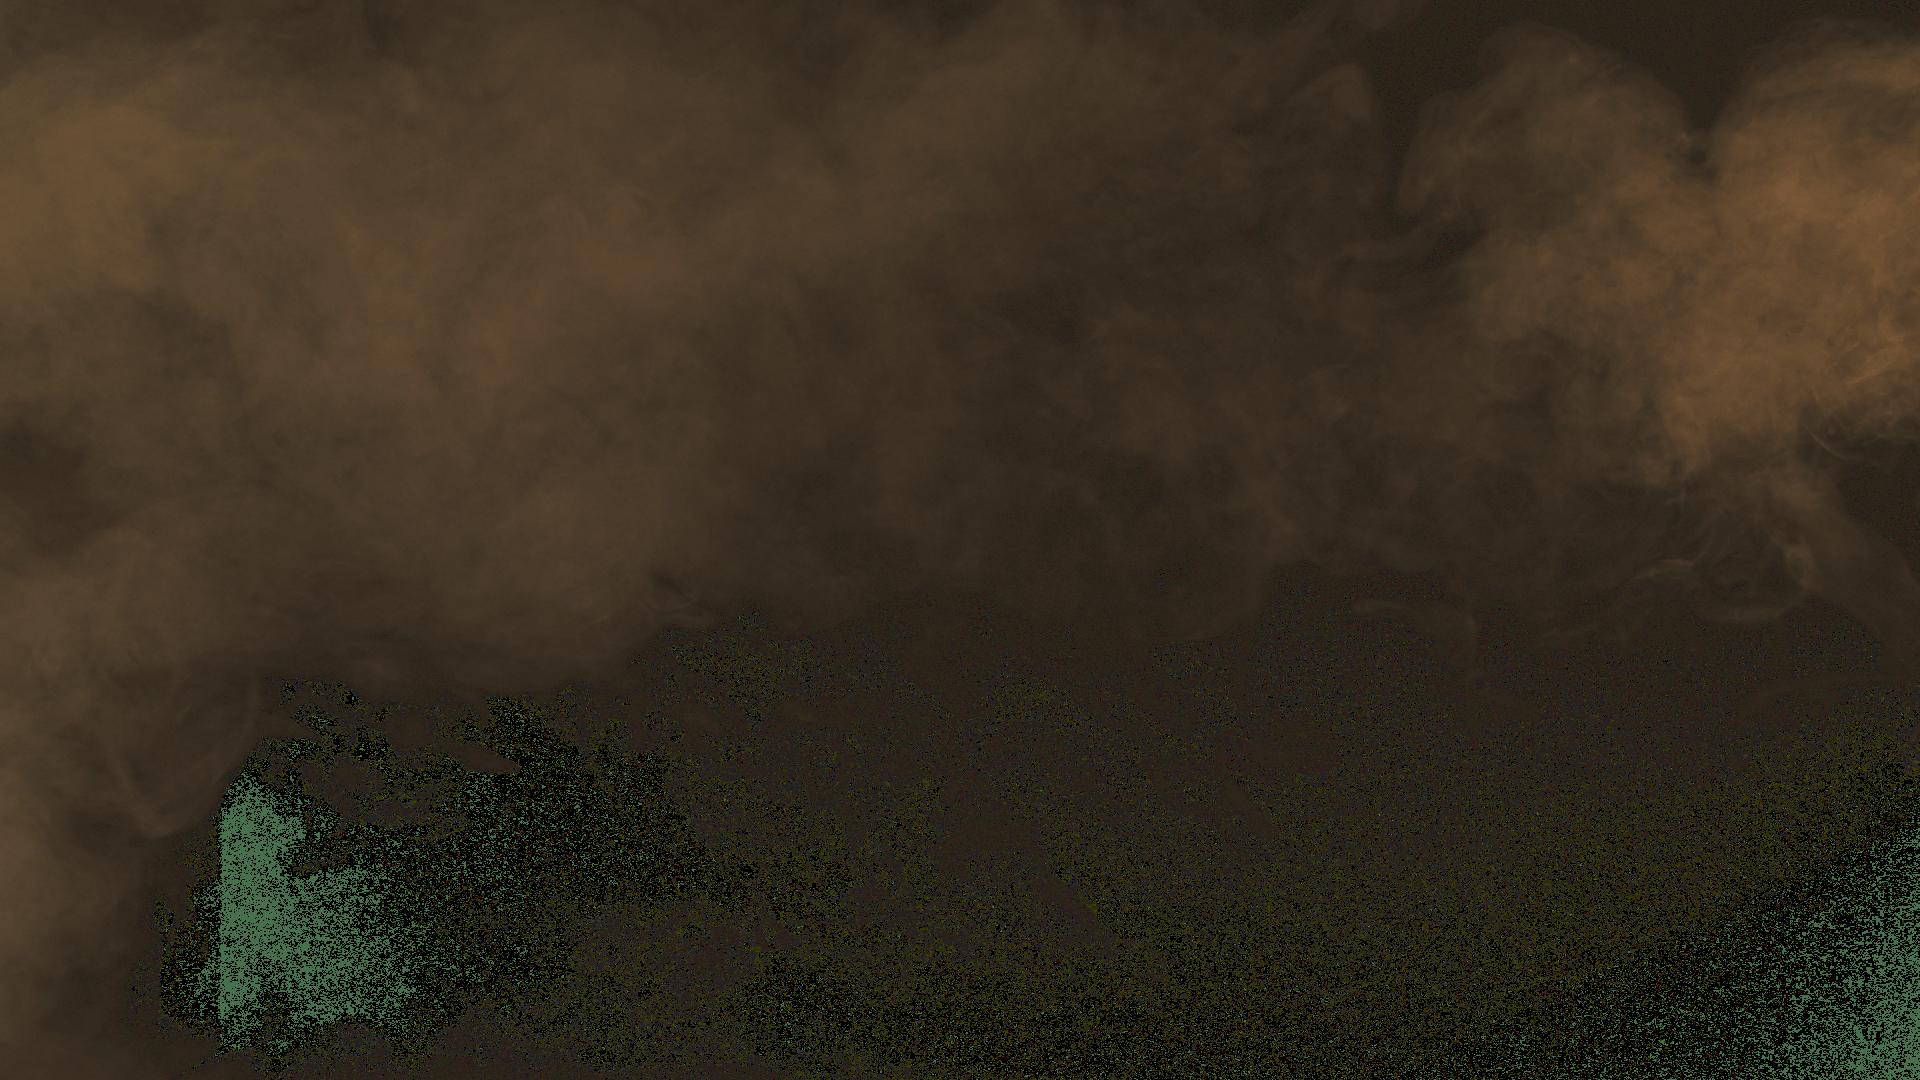 Fog texture png